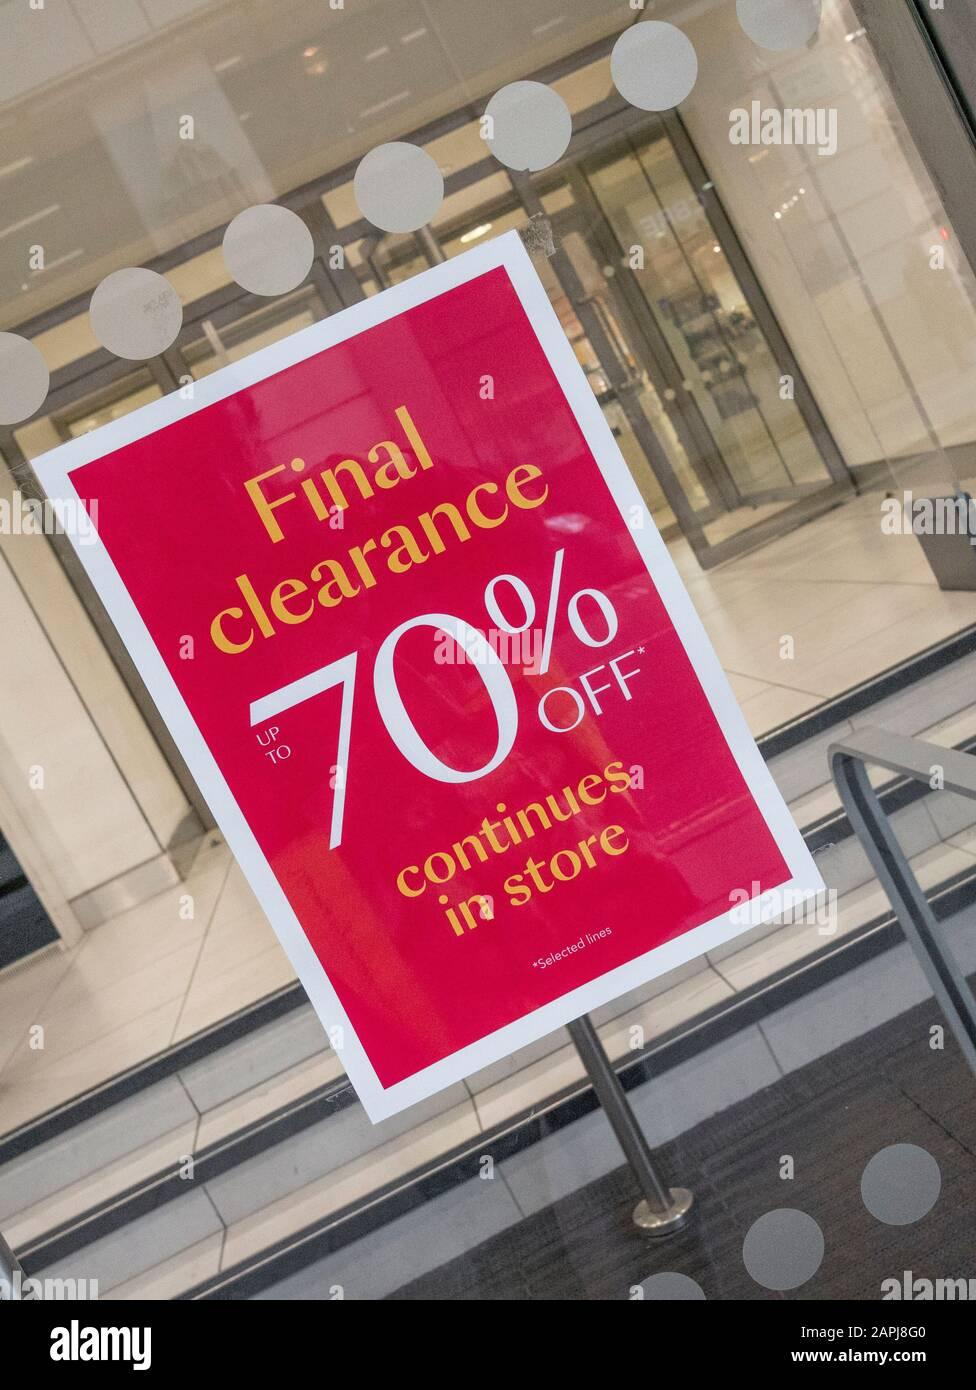 Debenhams Final Clearance / 70% off sale sign (Jan. 2020). Metaphor for high street crisis, Debenhams retail crisis, death of the high street. Stock Photo